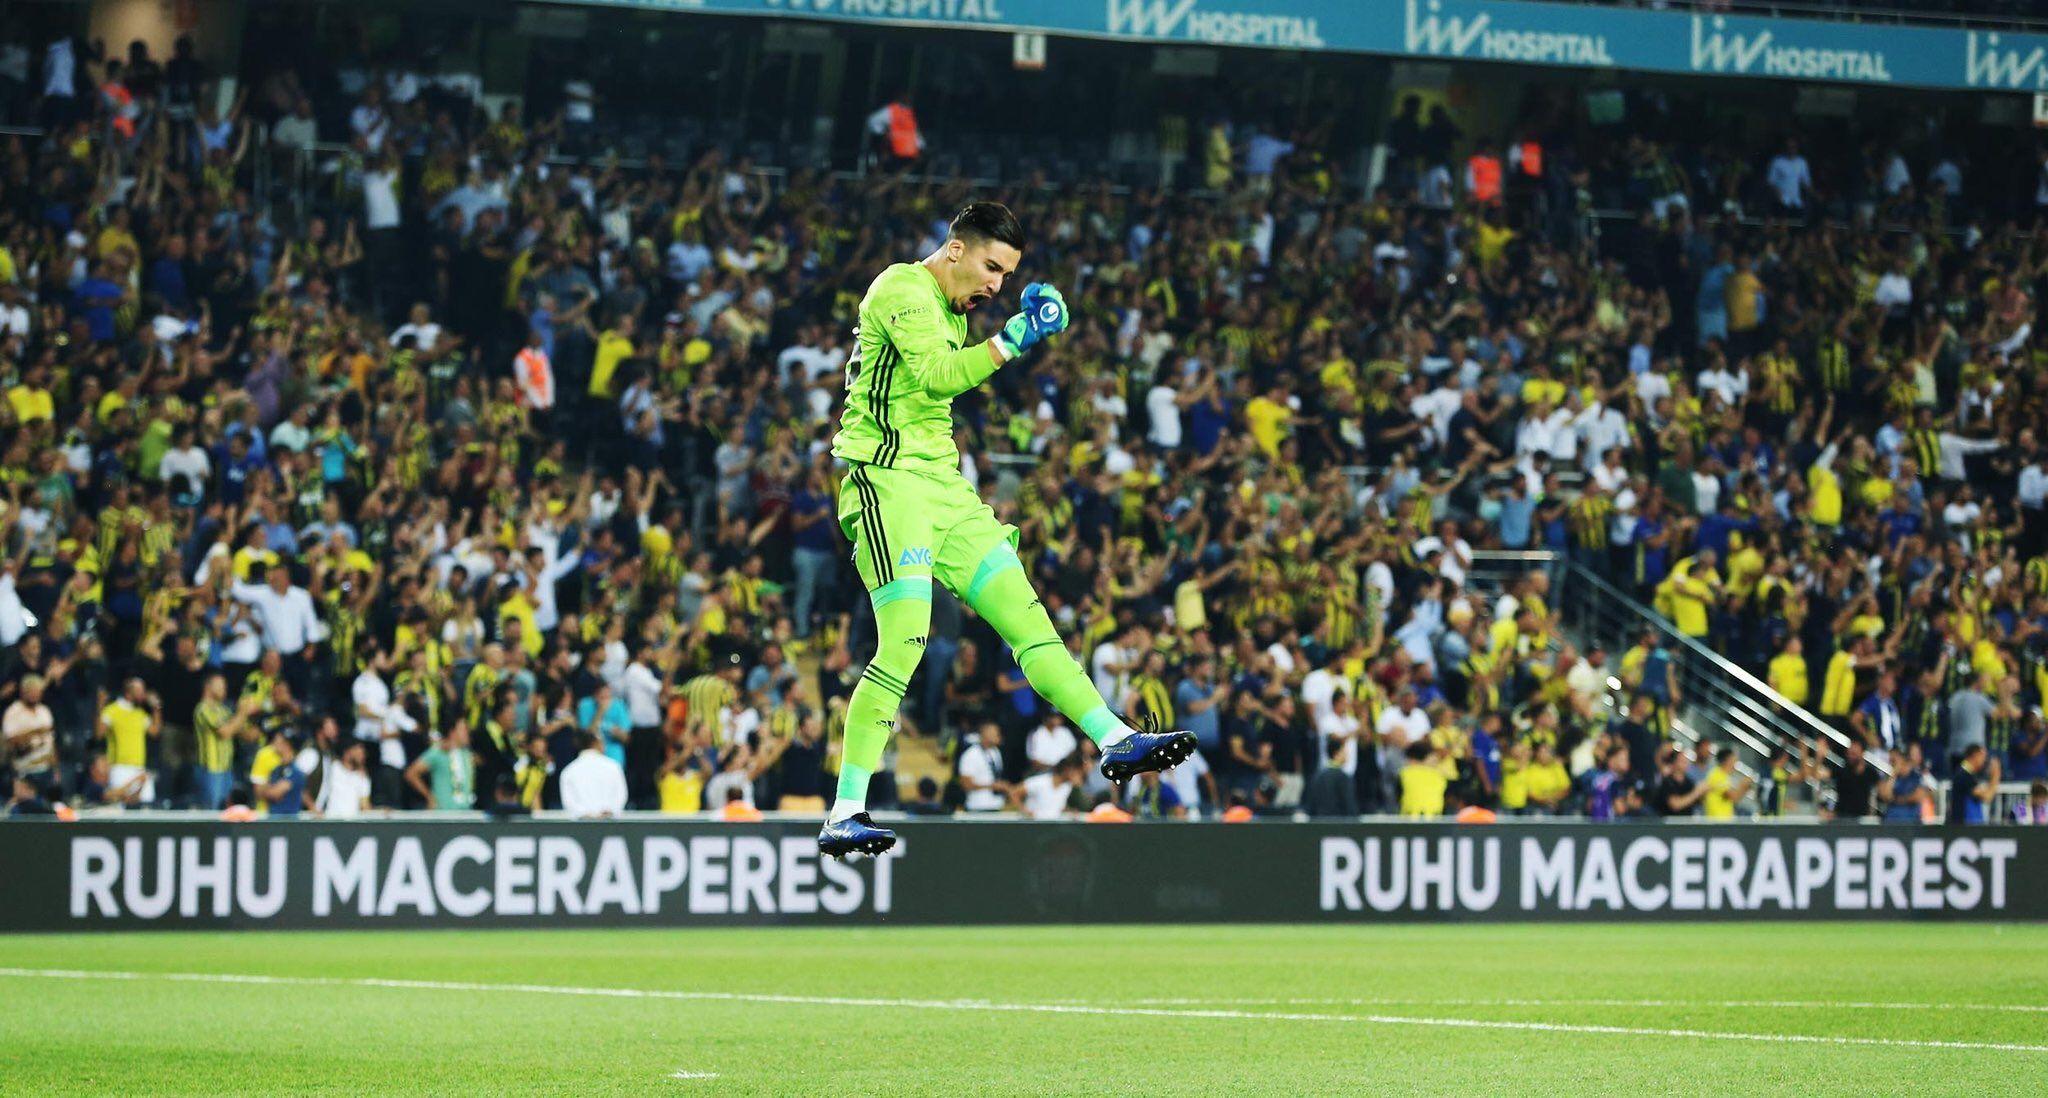 S E R O T O N I N On Twitter Soccer Field Twitter Sports